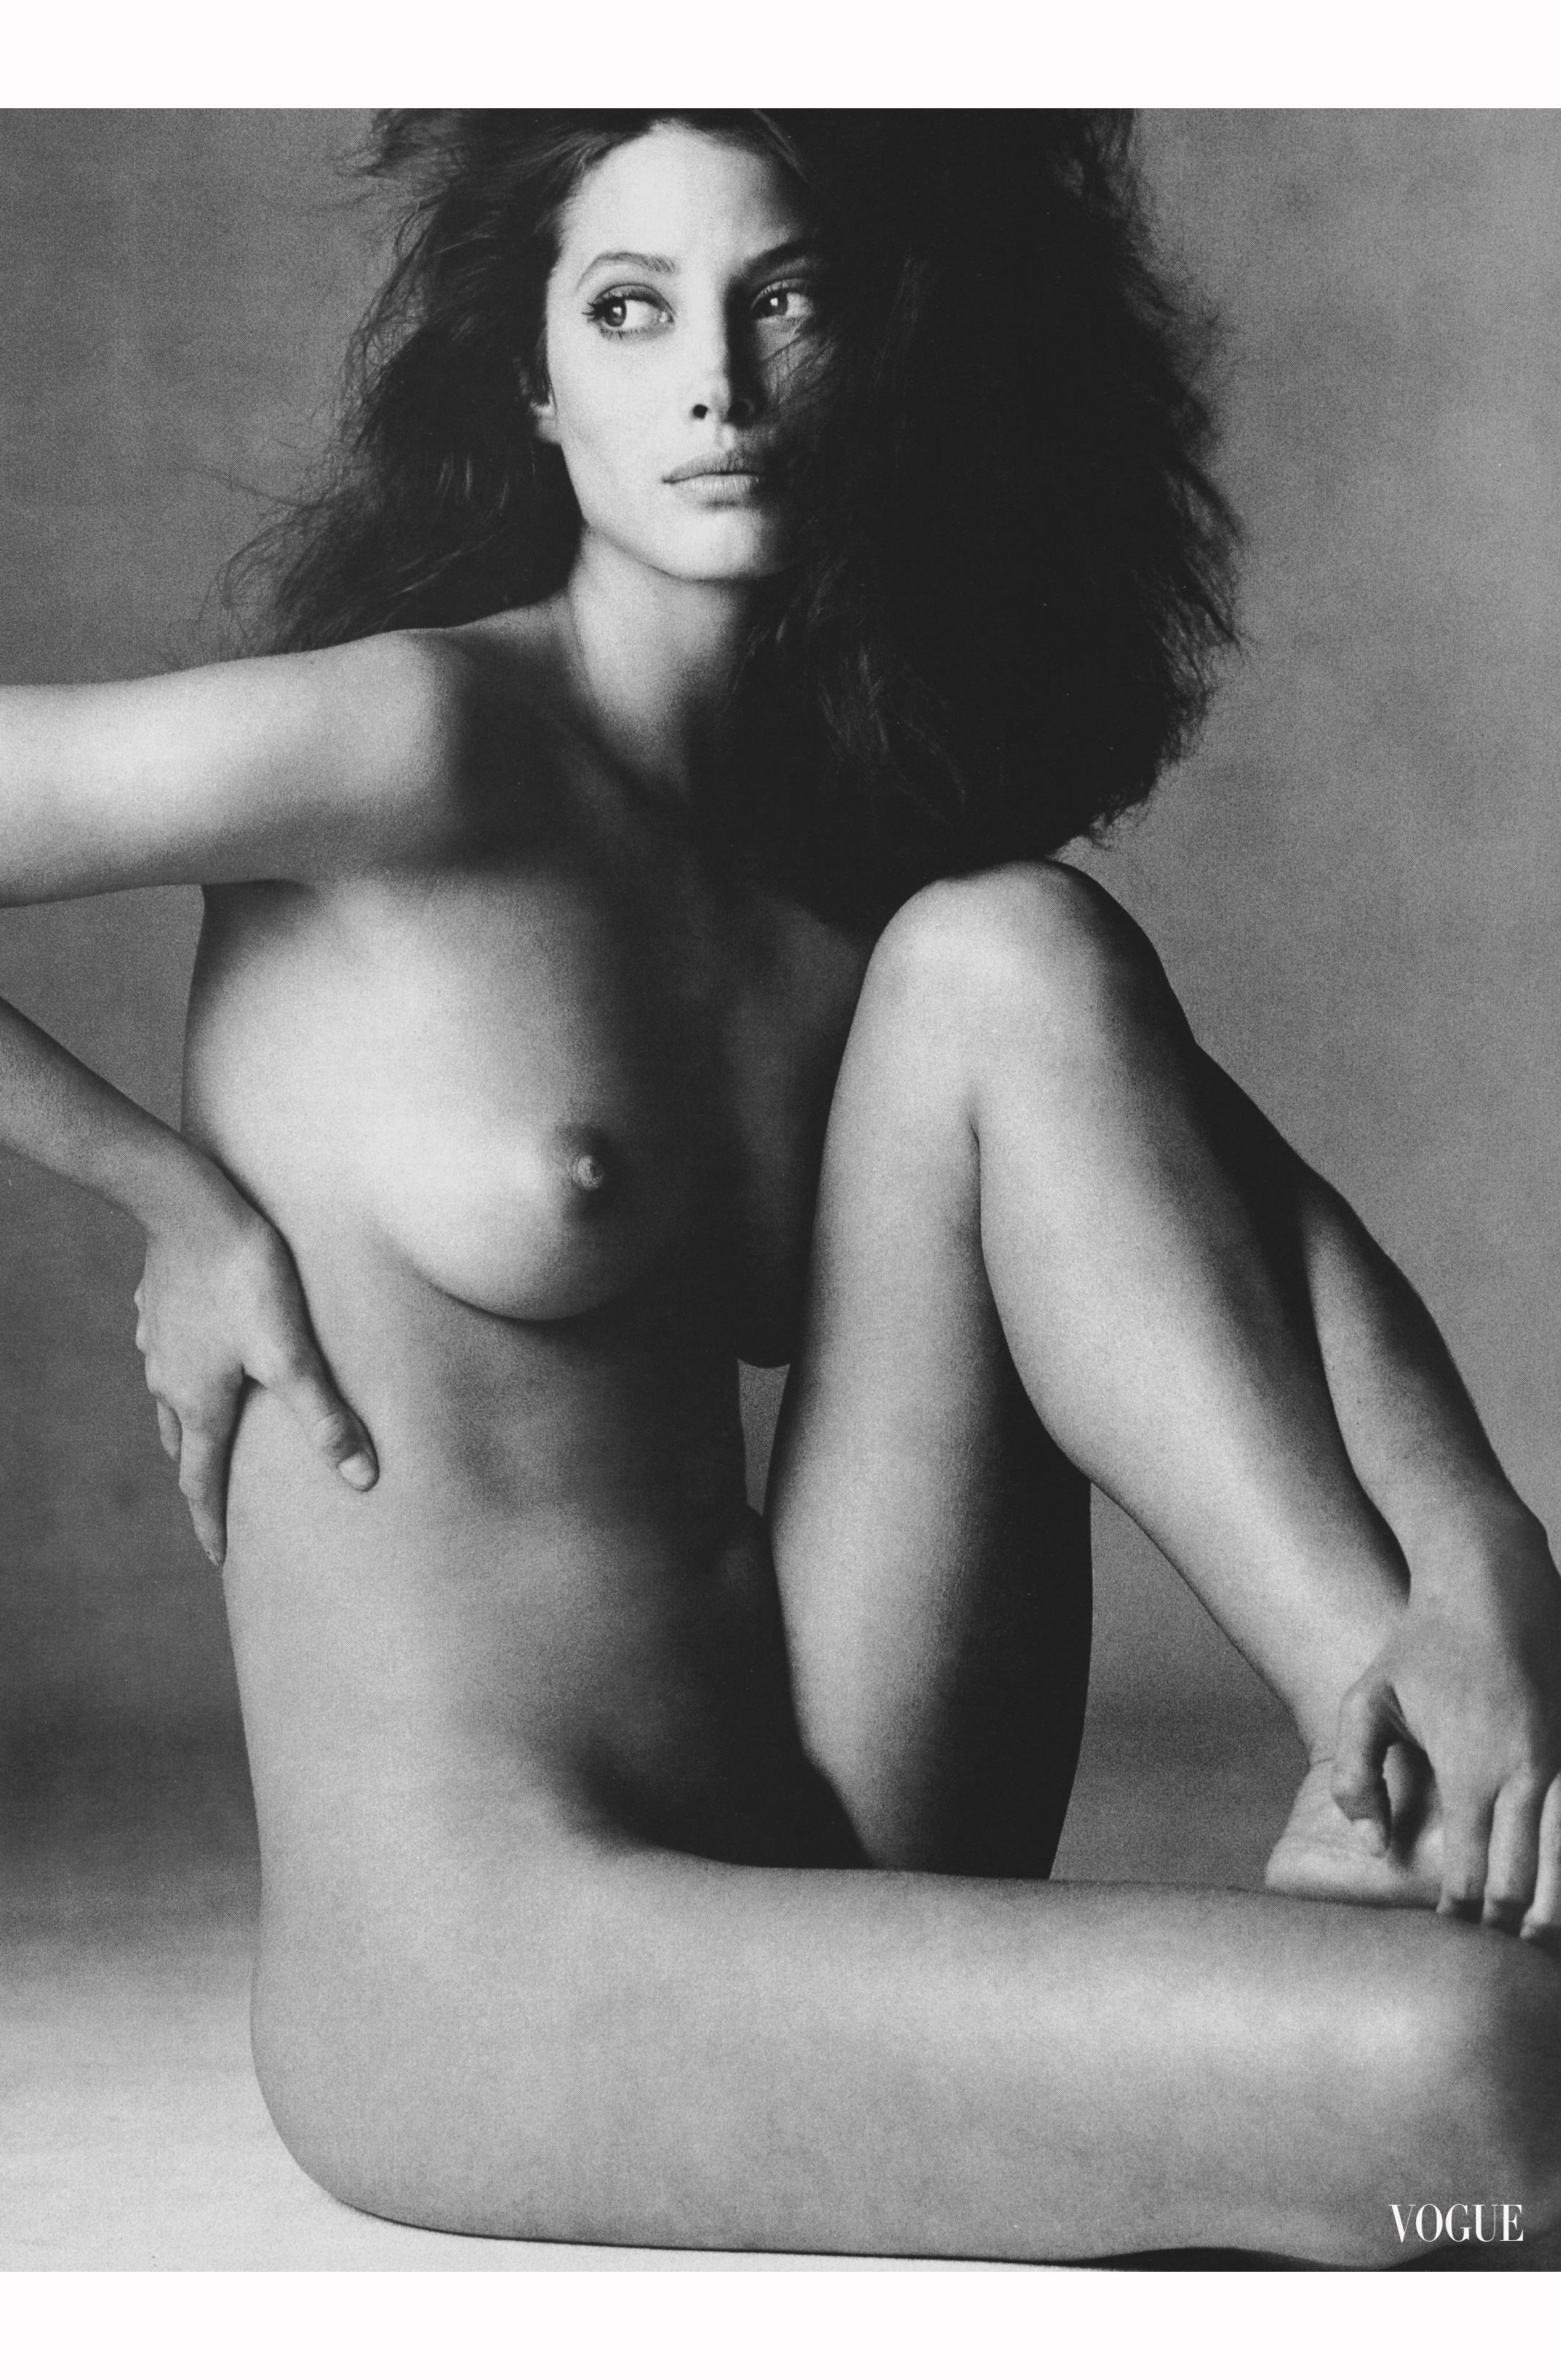 Ashleigh valdez nude